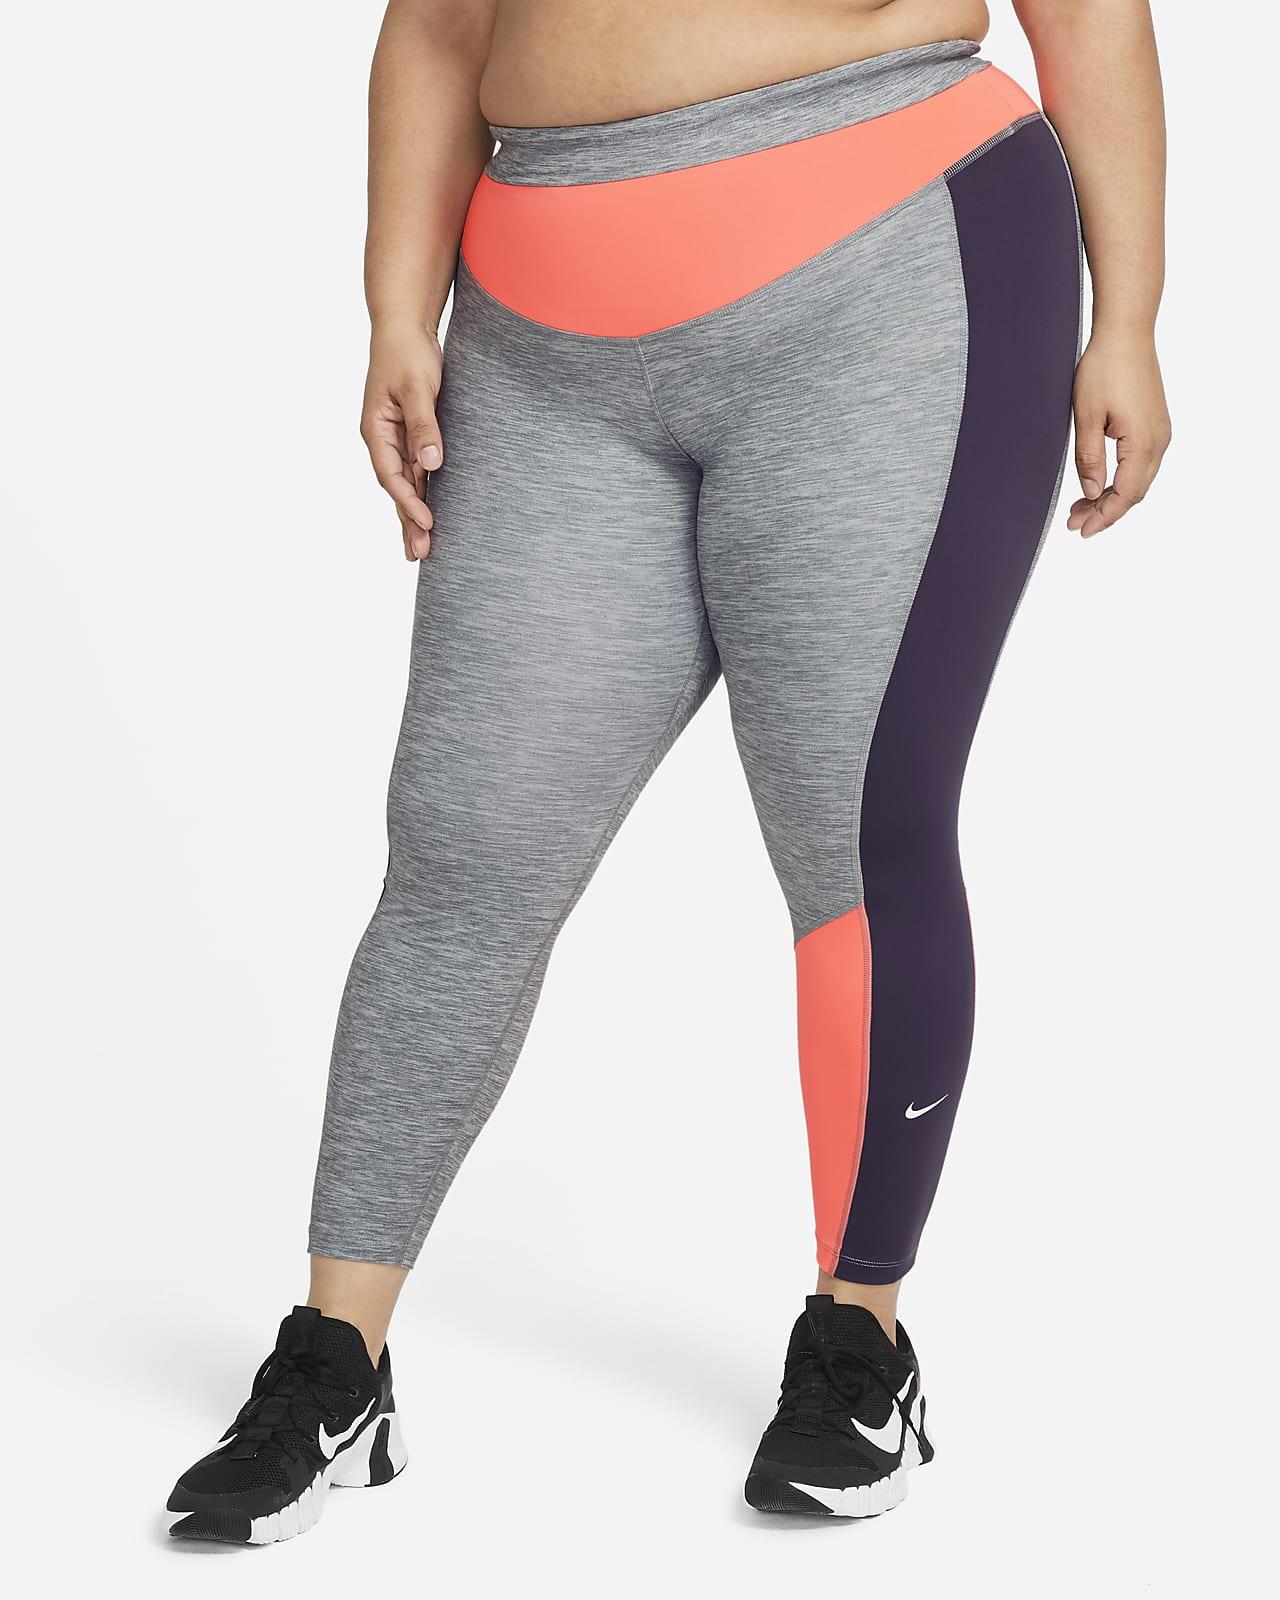 Legging 7/8 color-block chiné Nike One pour Femme (grande taille)